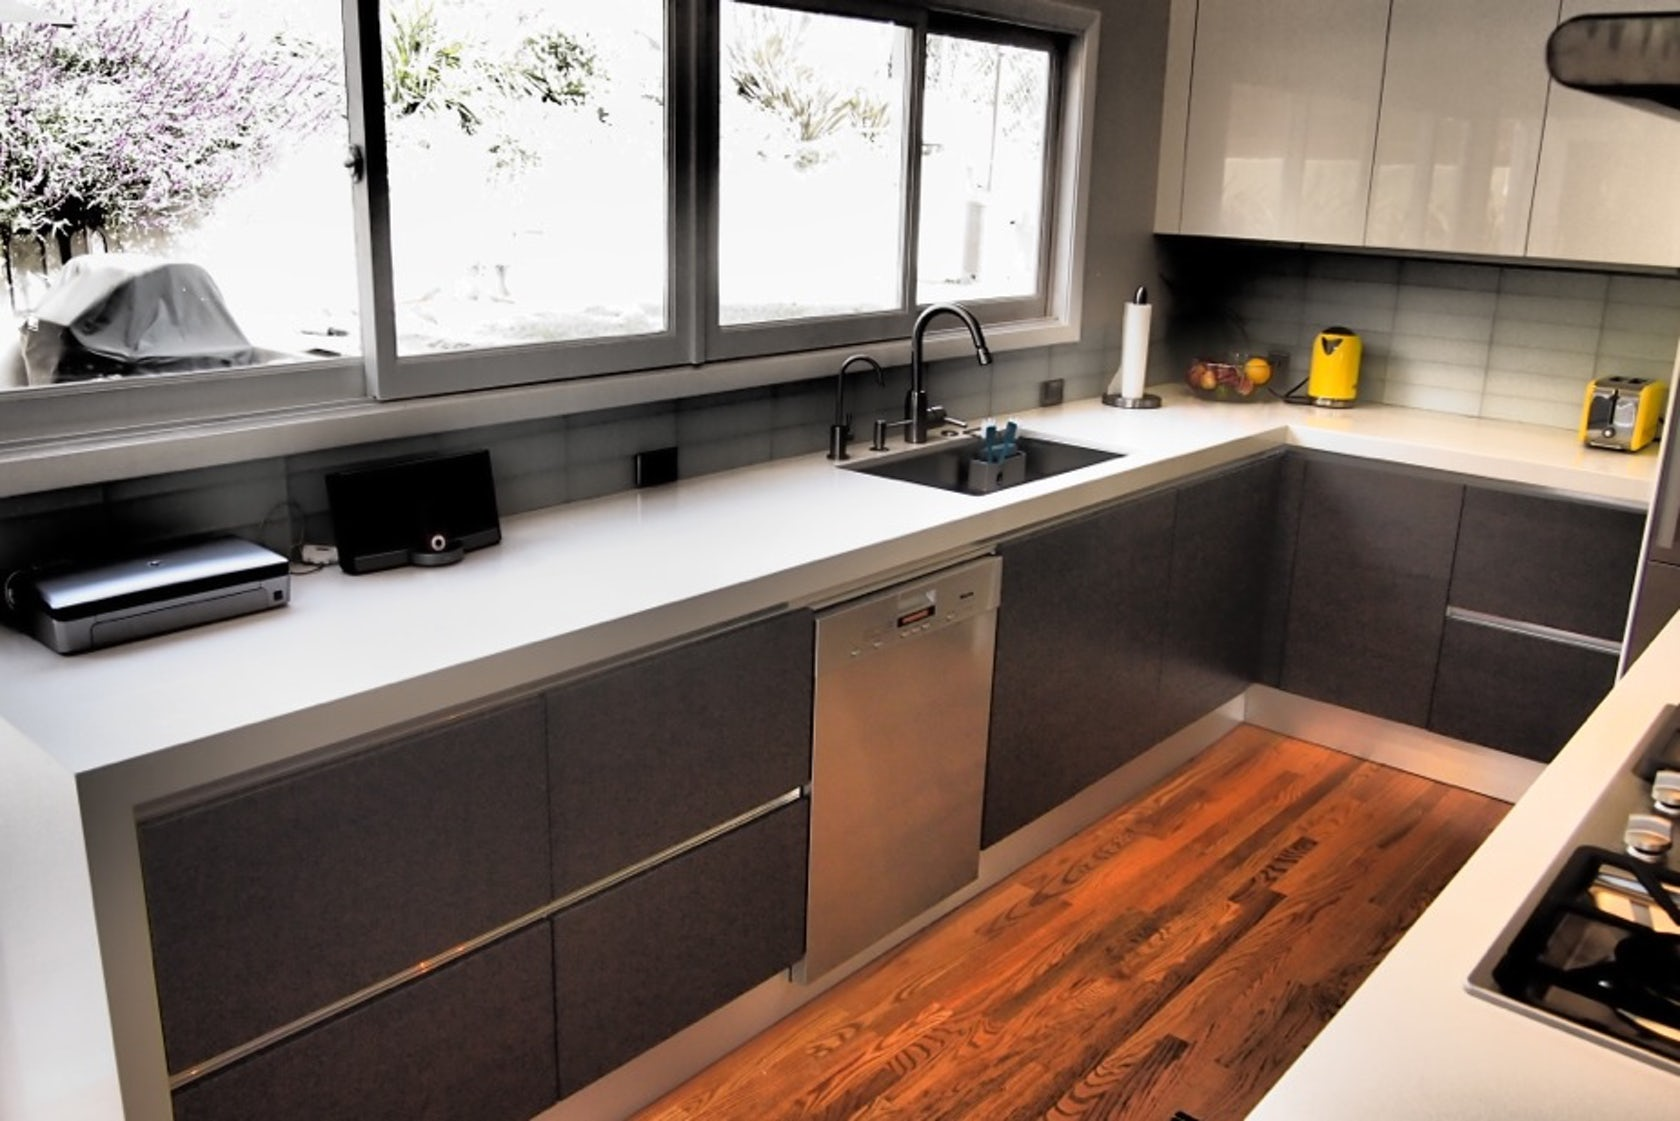 Miele kitchen by jorge martinez architizer - Miele kitchen cabinets ...